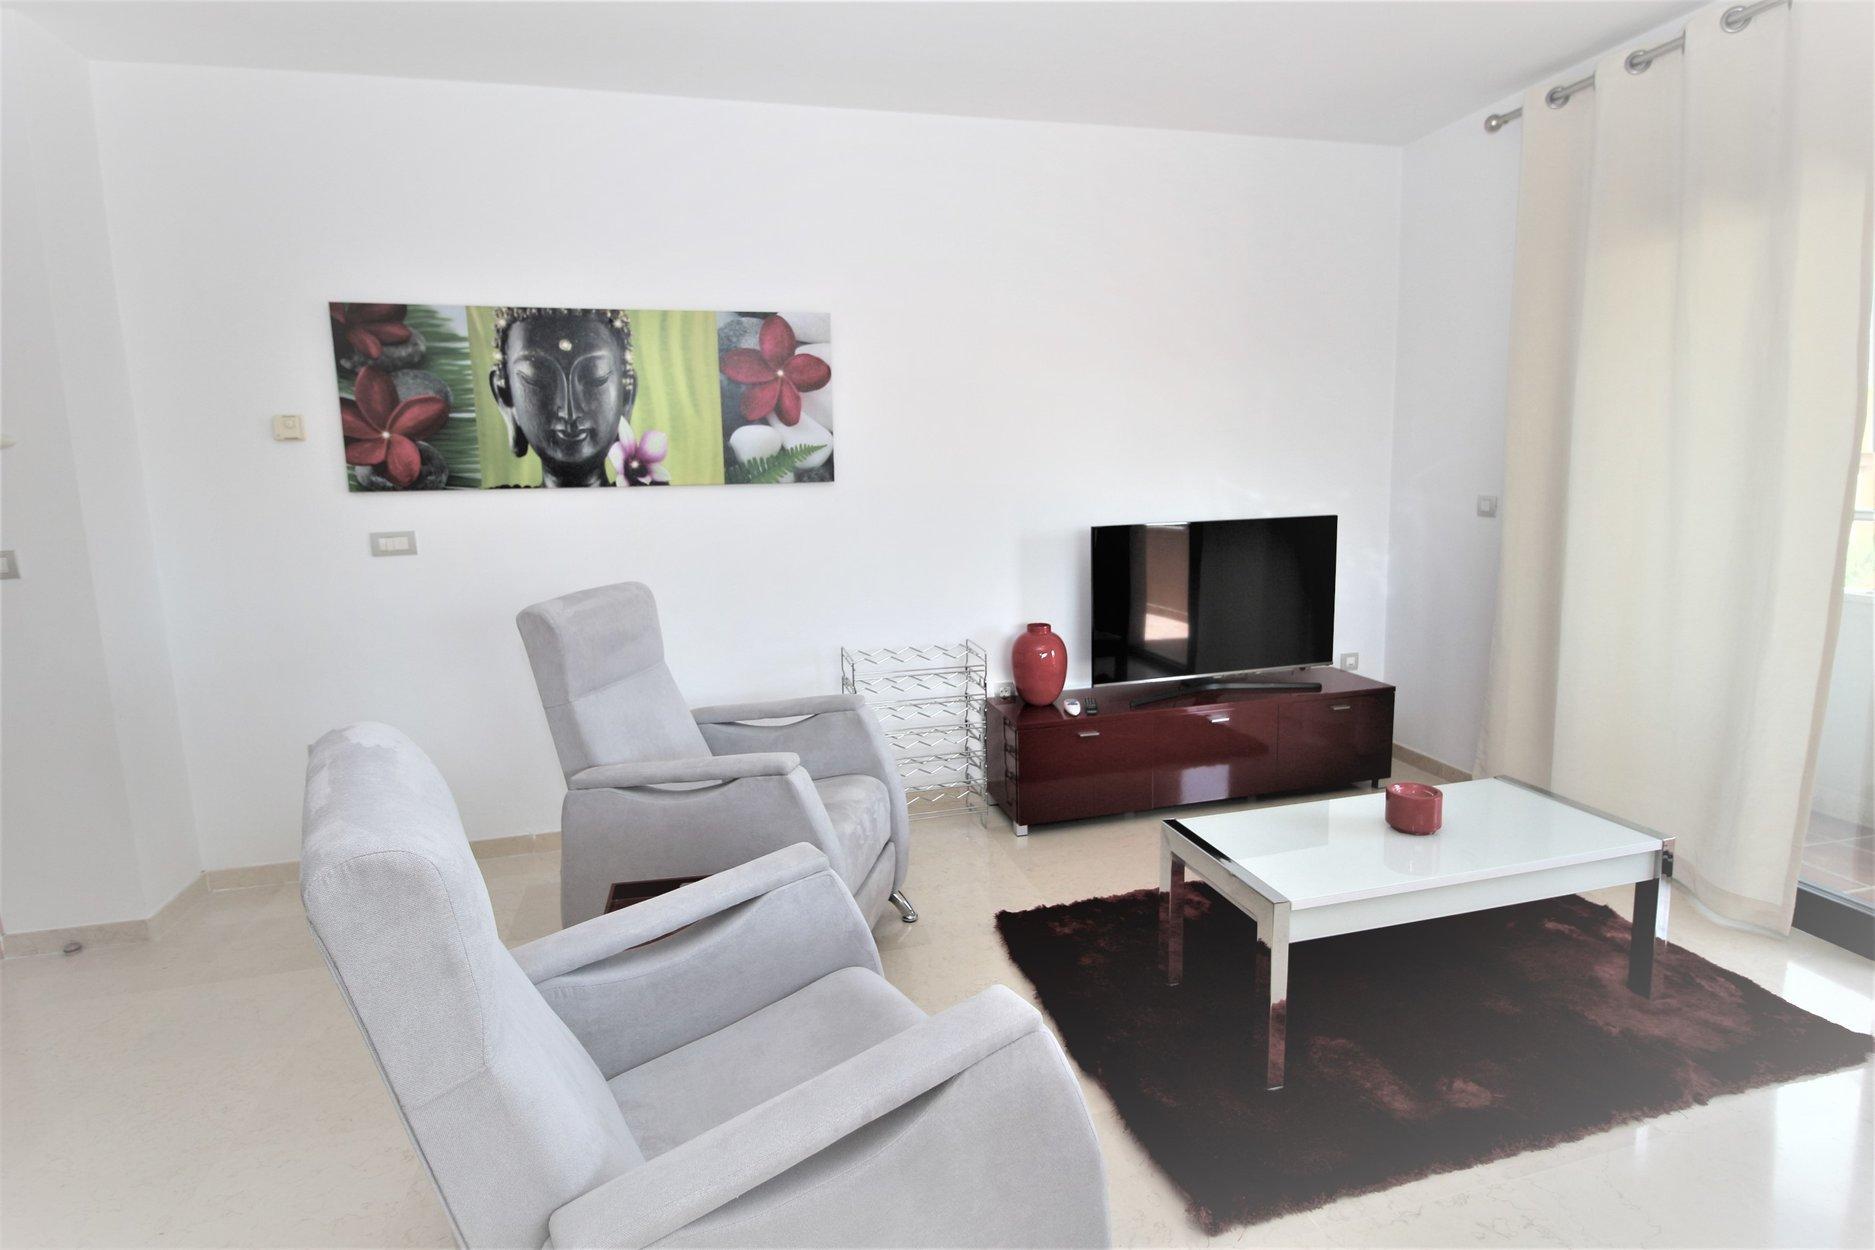 images apartment